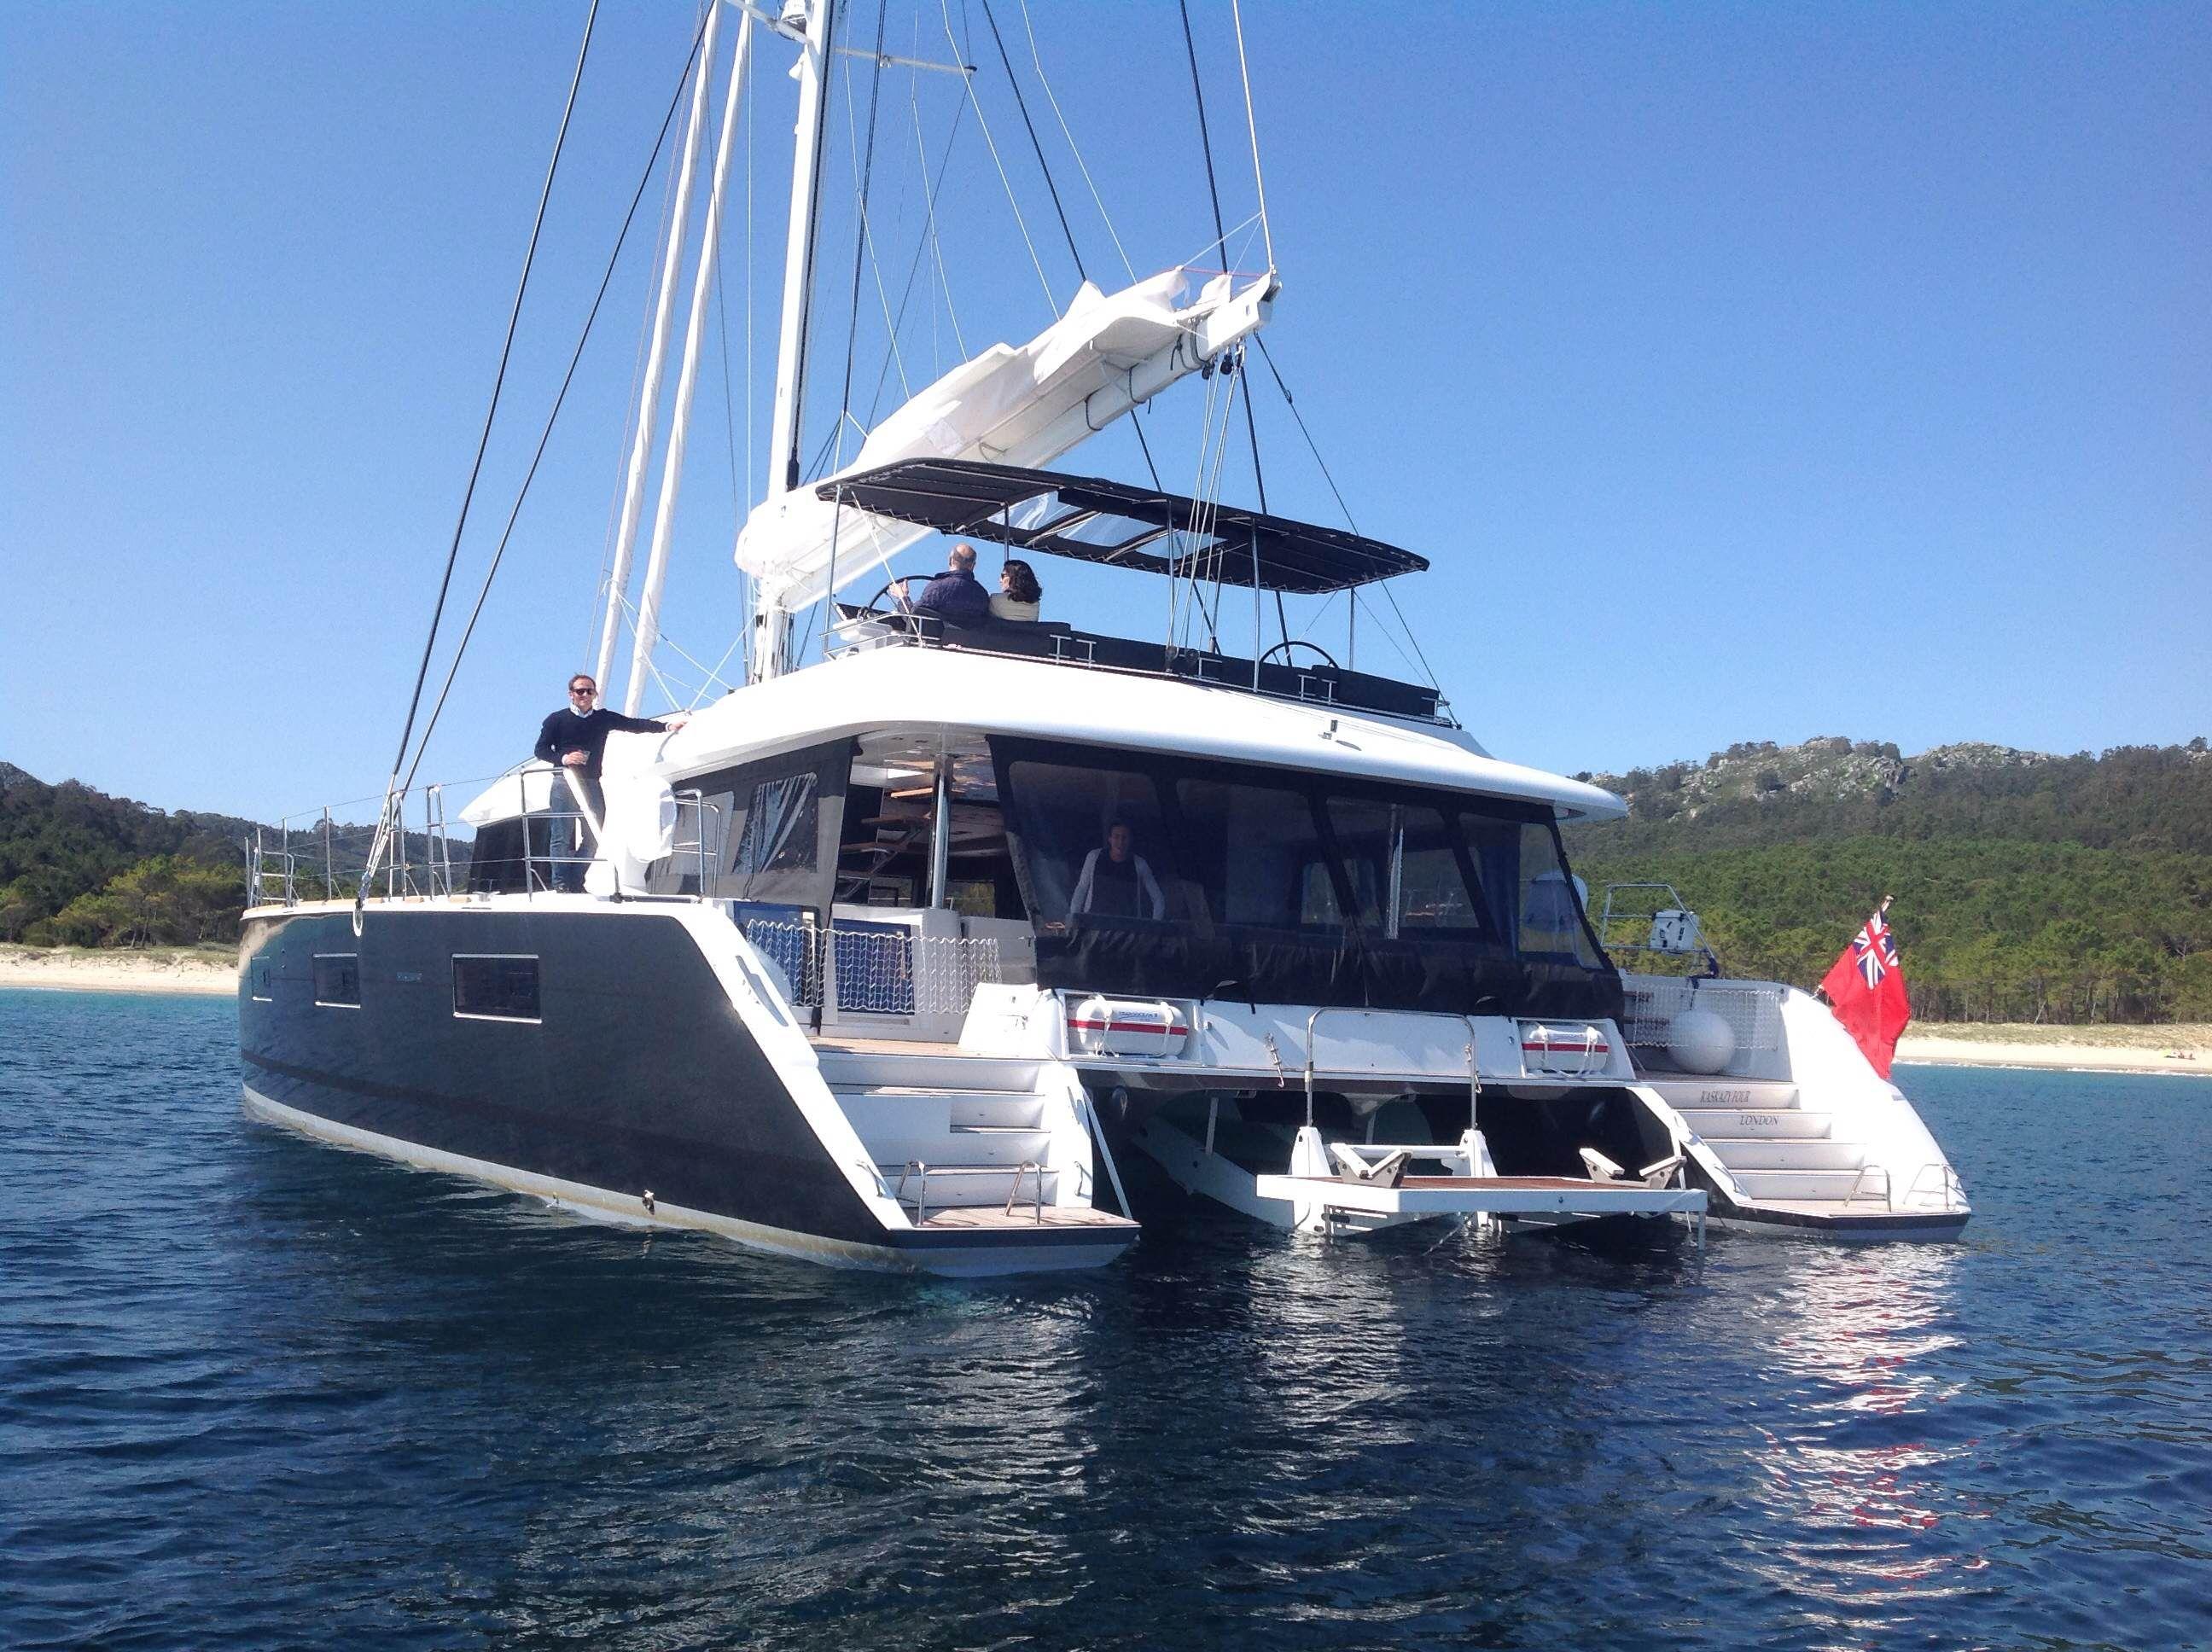 KASKAZI FOUR Lagoon 620 Luxury Catamaran Rear View